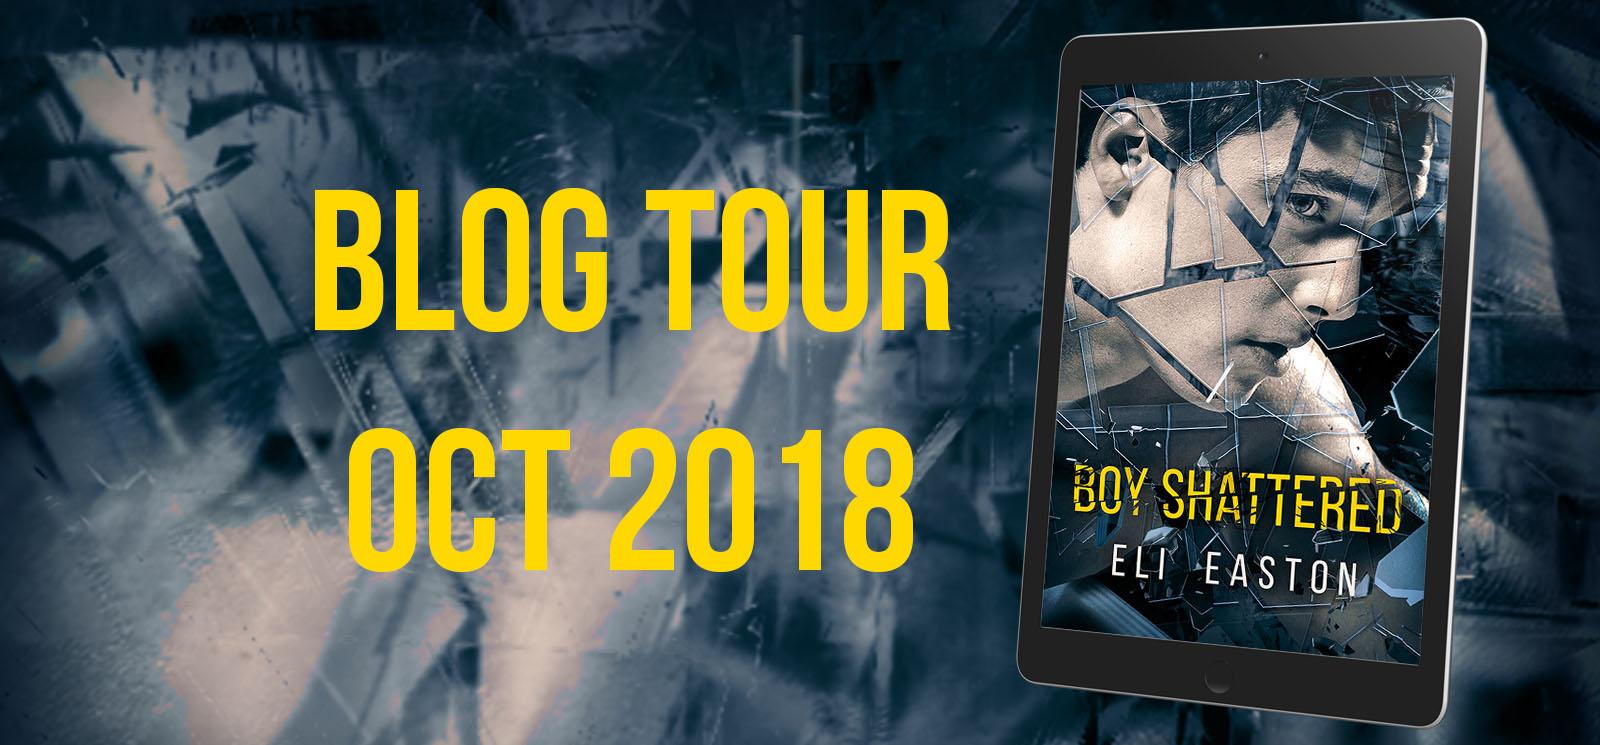 Boy Shattered blog tour.jpg